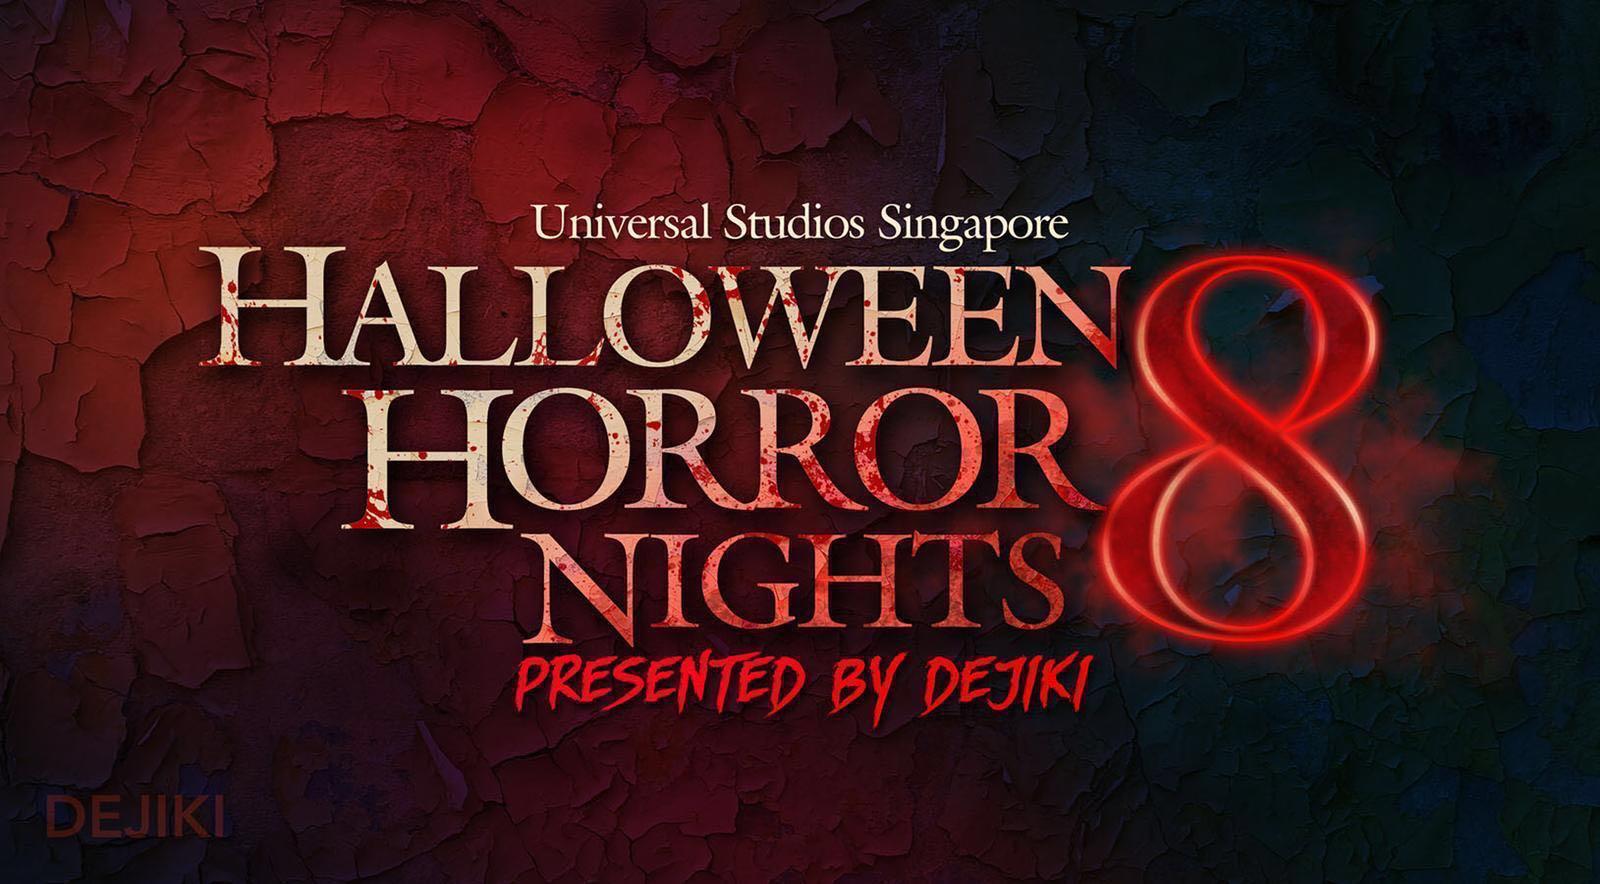 uss halloween horror night 8 (peak - open date), entertainment